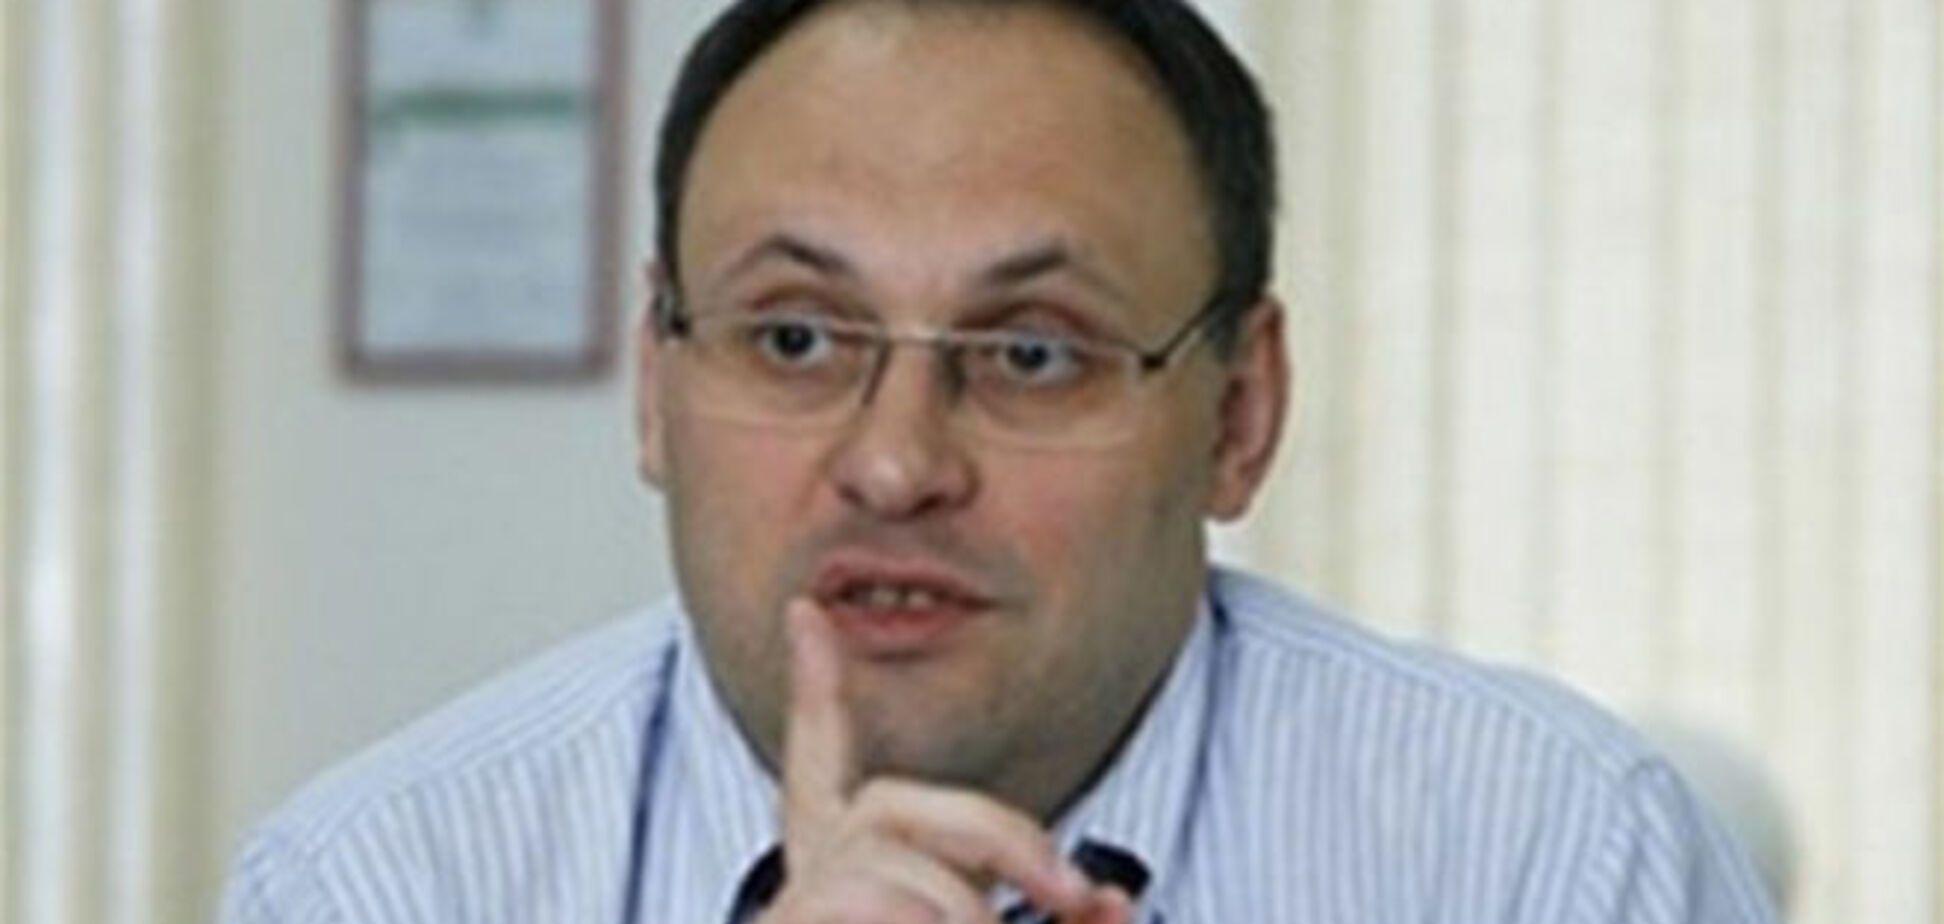 У Каськива при обыске нашли автомат бывшего комбата 'Айдара' - нардеп